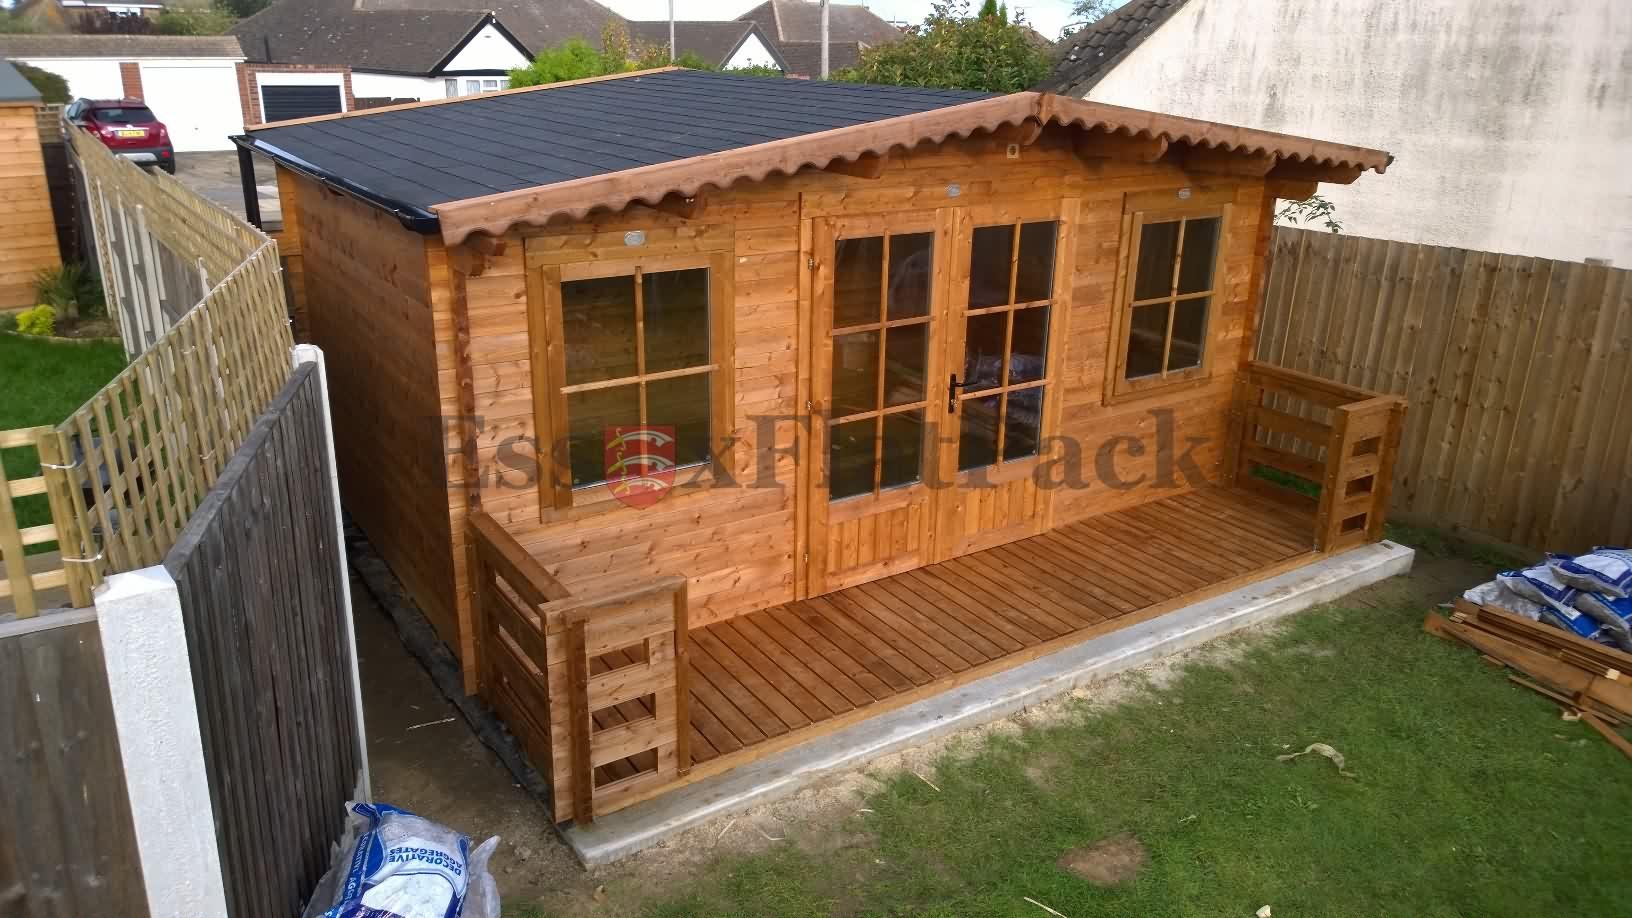 essexflatpack-log-cabins-20170916174502.jpg